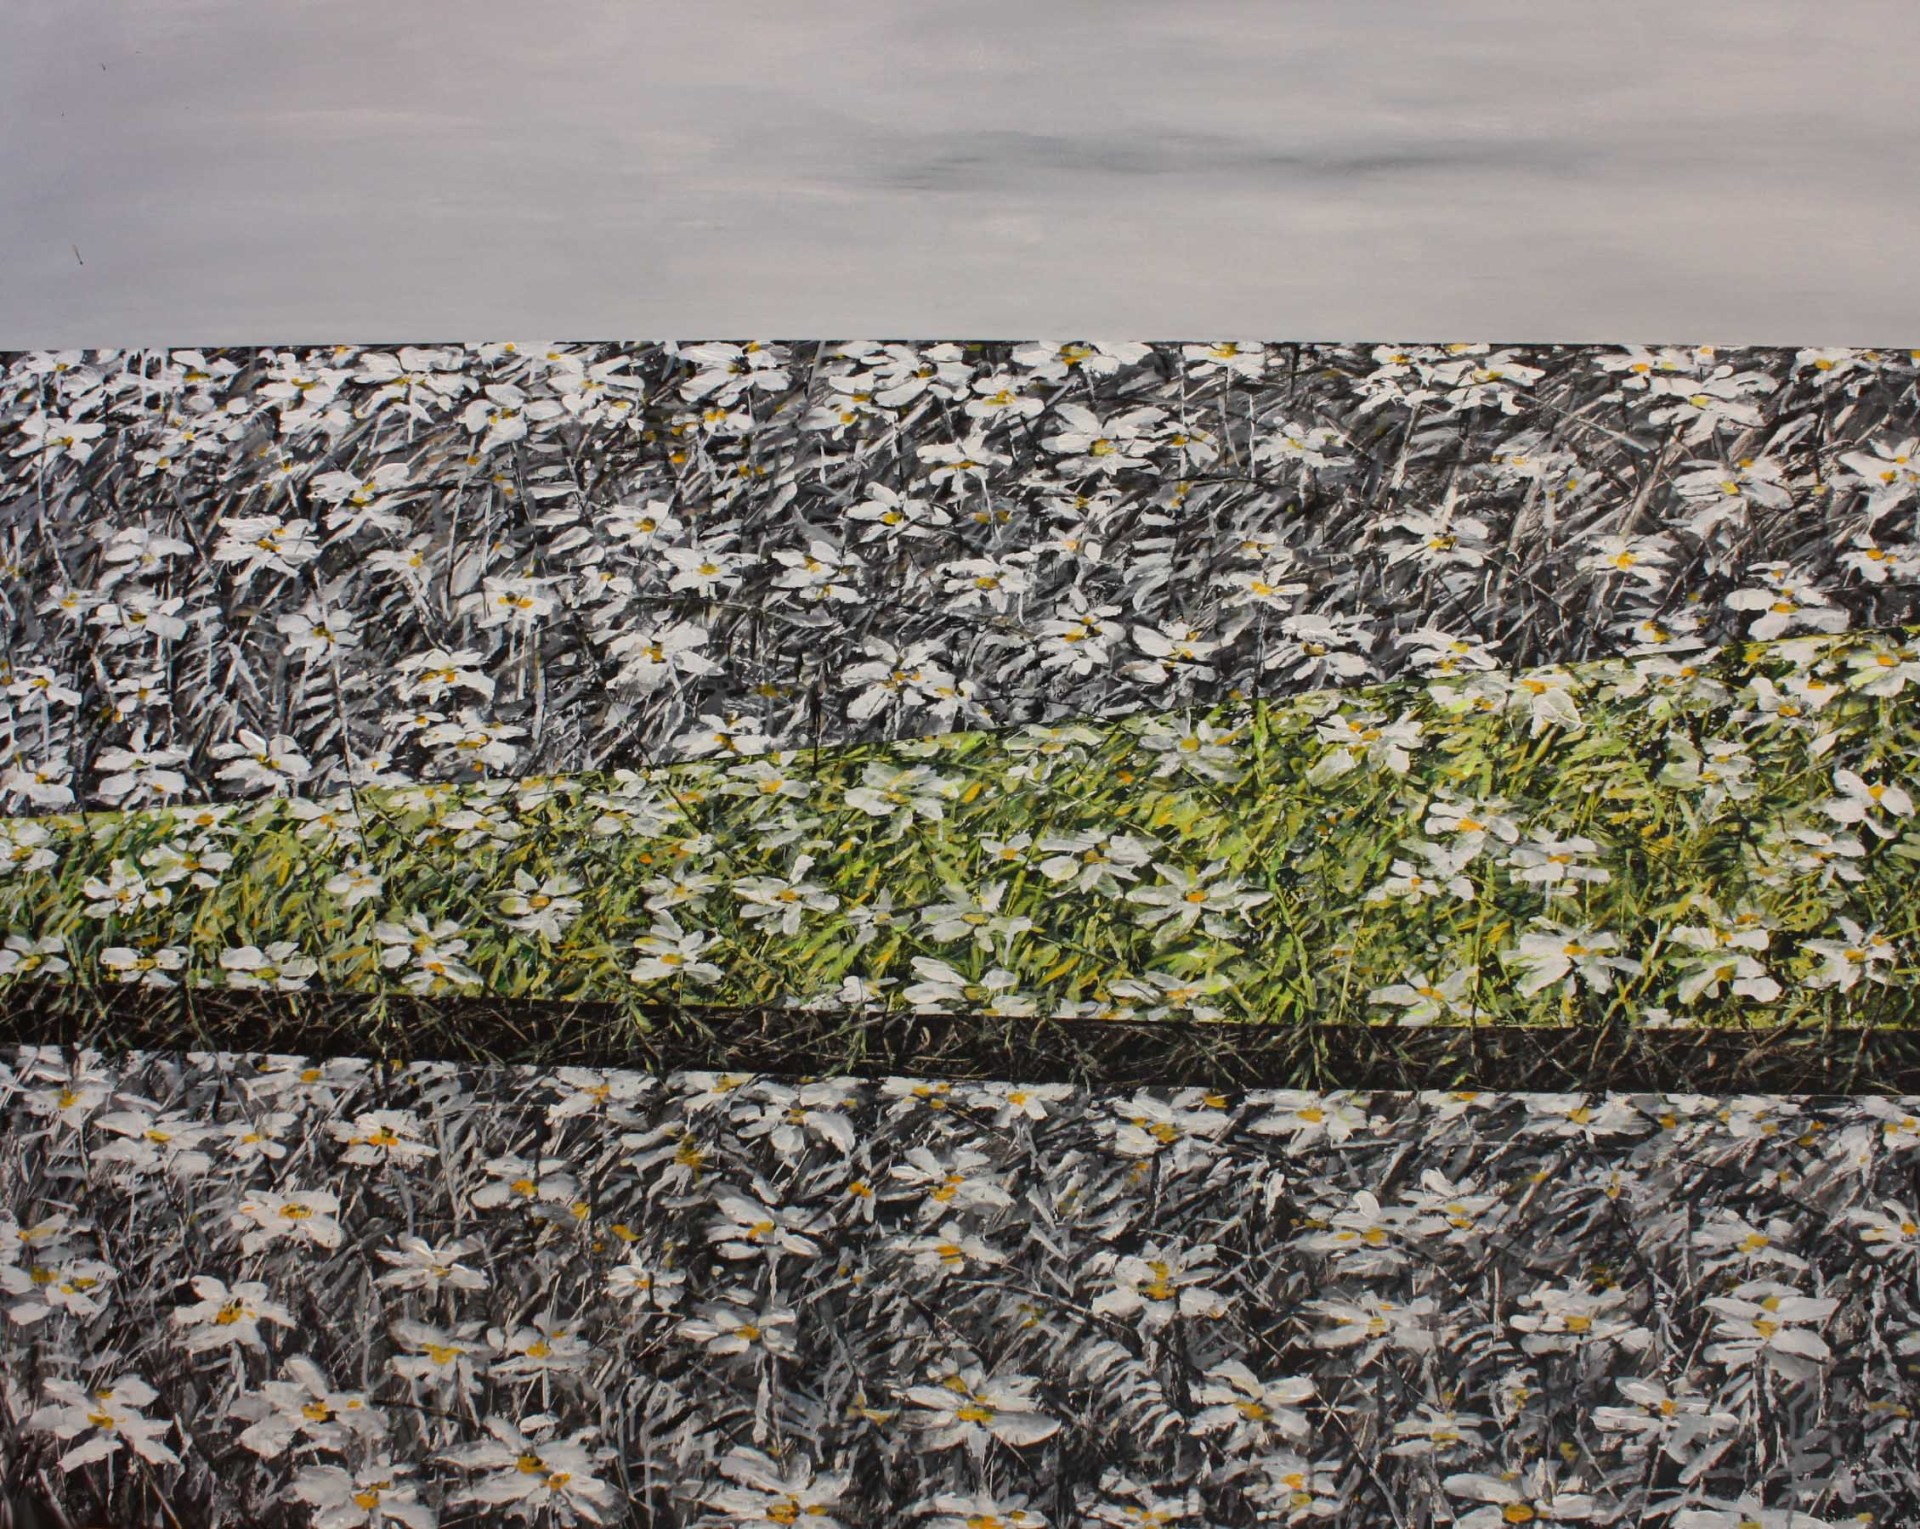 Daisies under gray sky